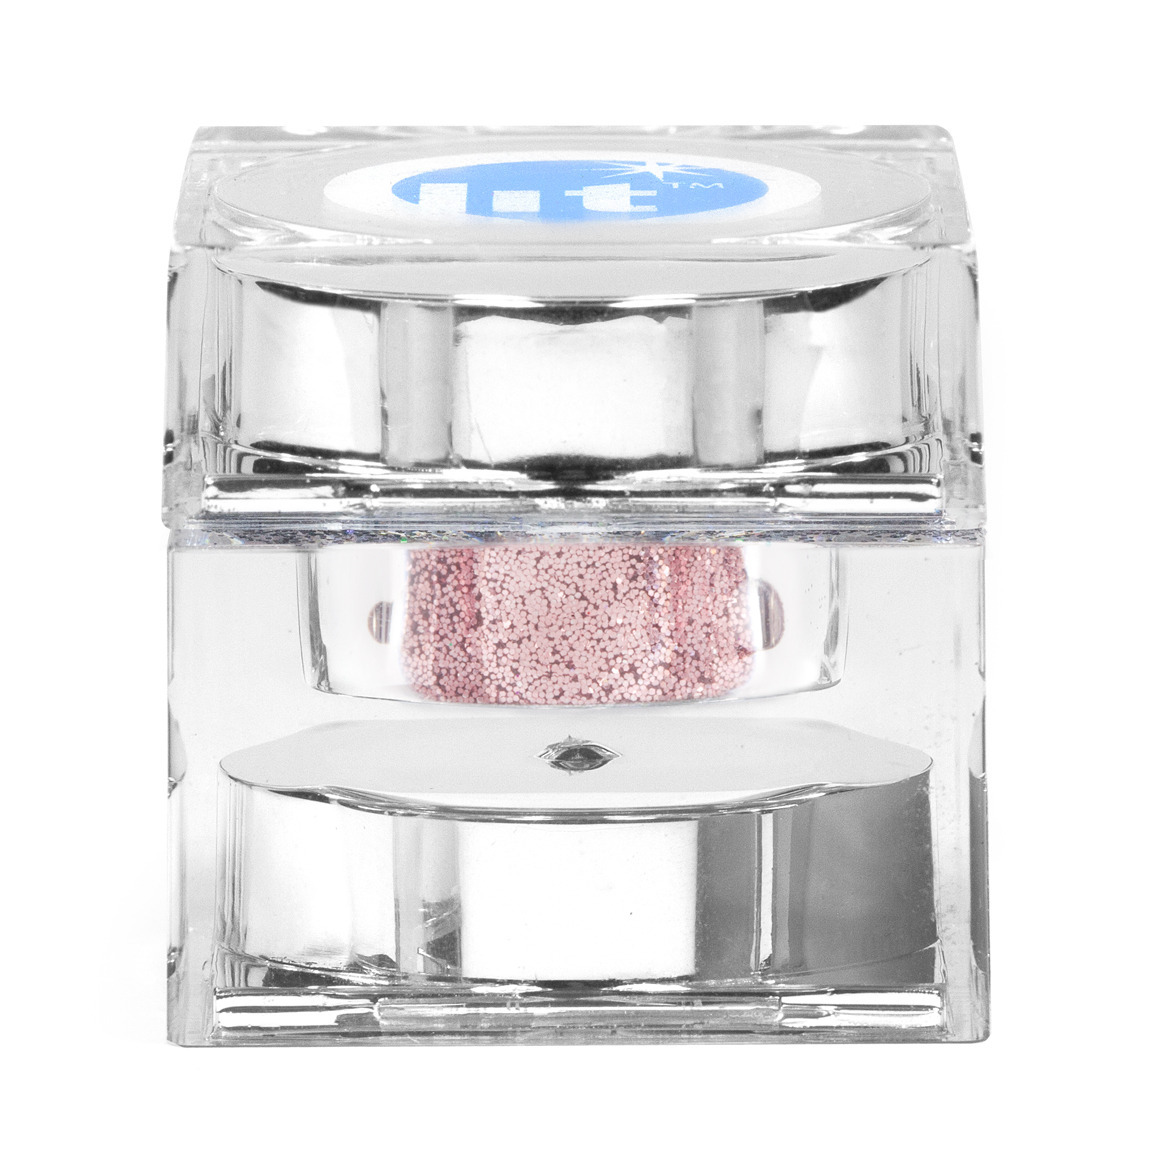 Lit Cosmetics Lit Glitter Pretty in Pink S3 (Solid)